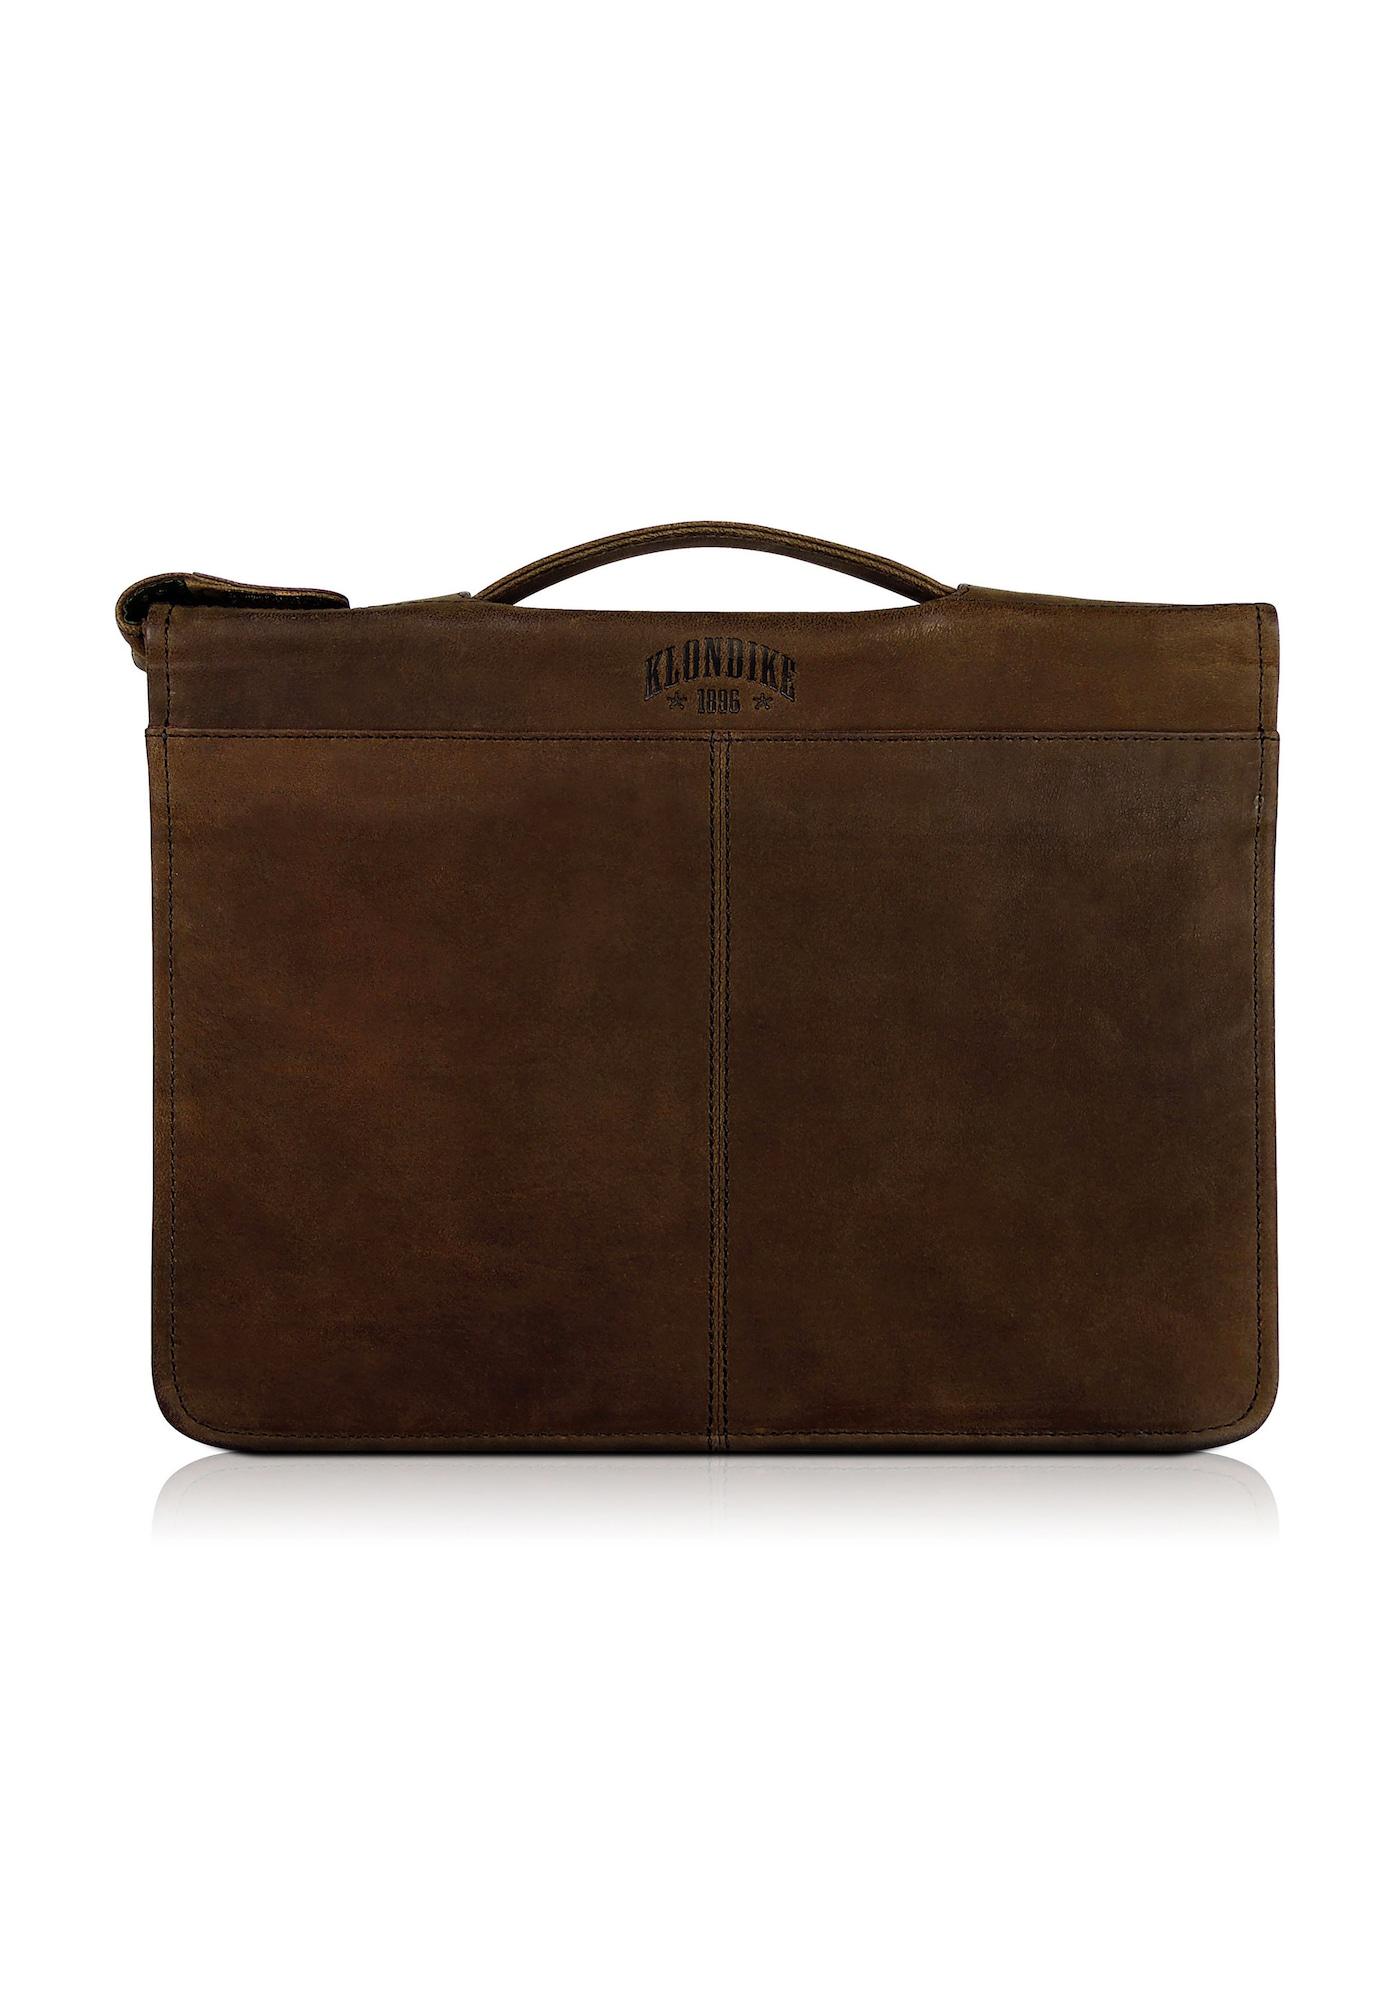 Dokumentenmappe 'Ben' | Taschen > Business Taschen > Dokumentenmappen | KLONDIKE 1896